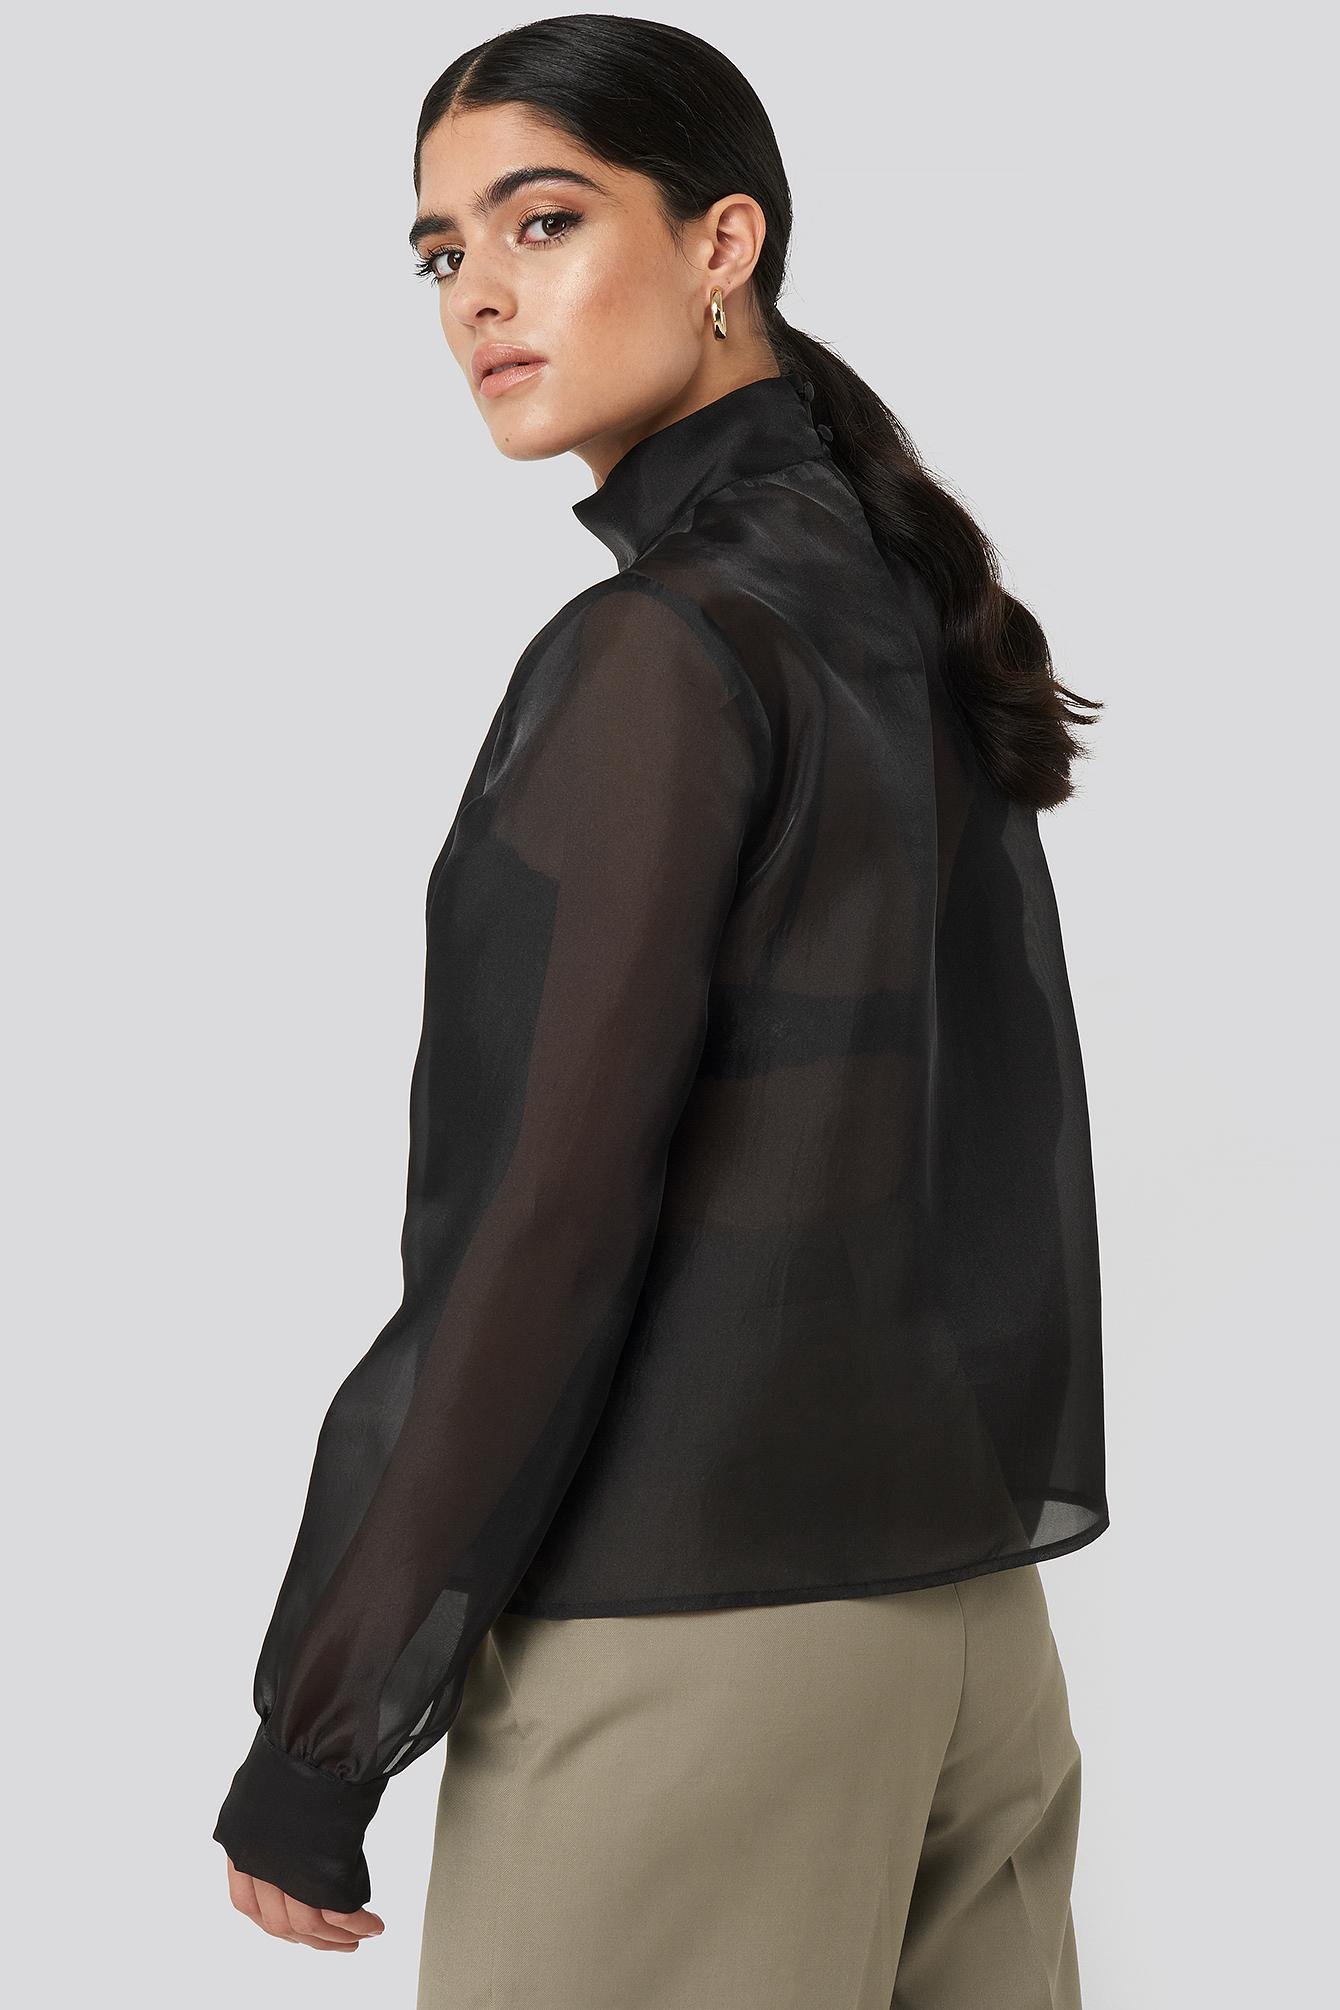 Eileen Fisher Synthetic Scoop-neck Sleeveless Skirt-wrap